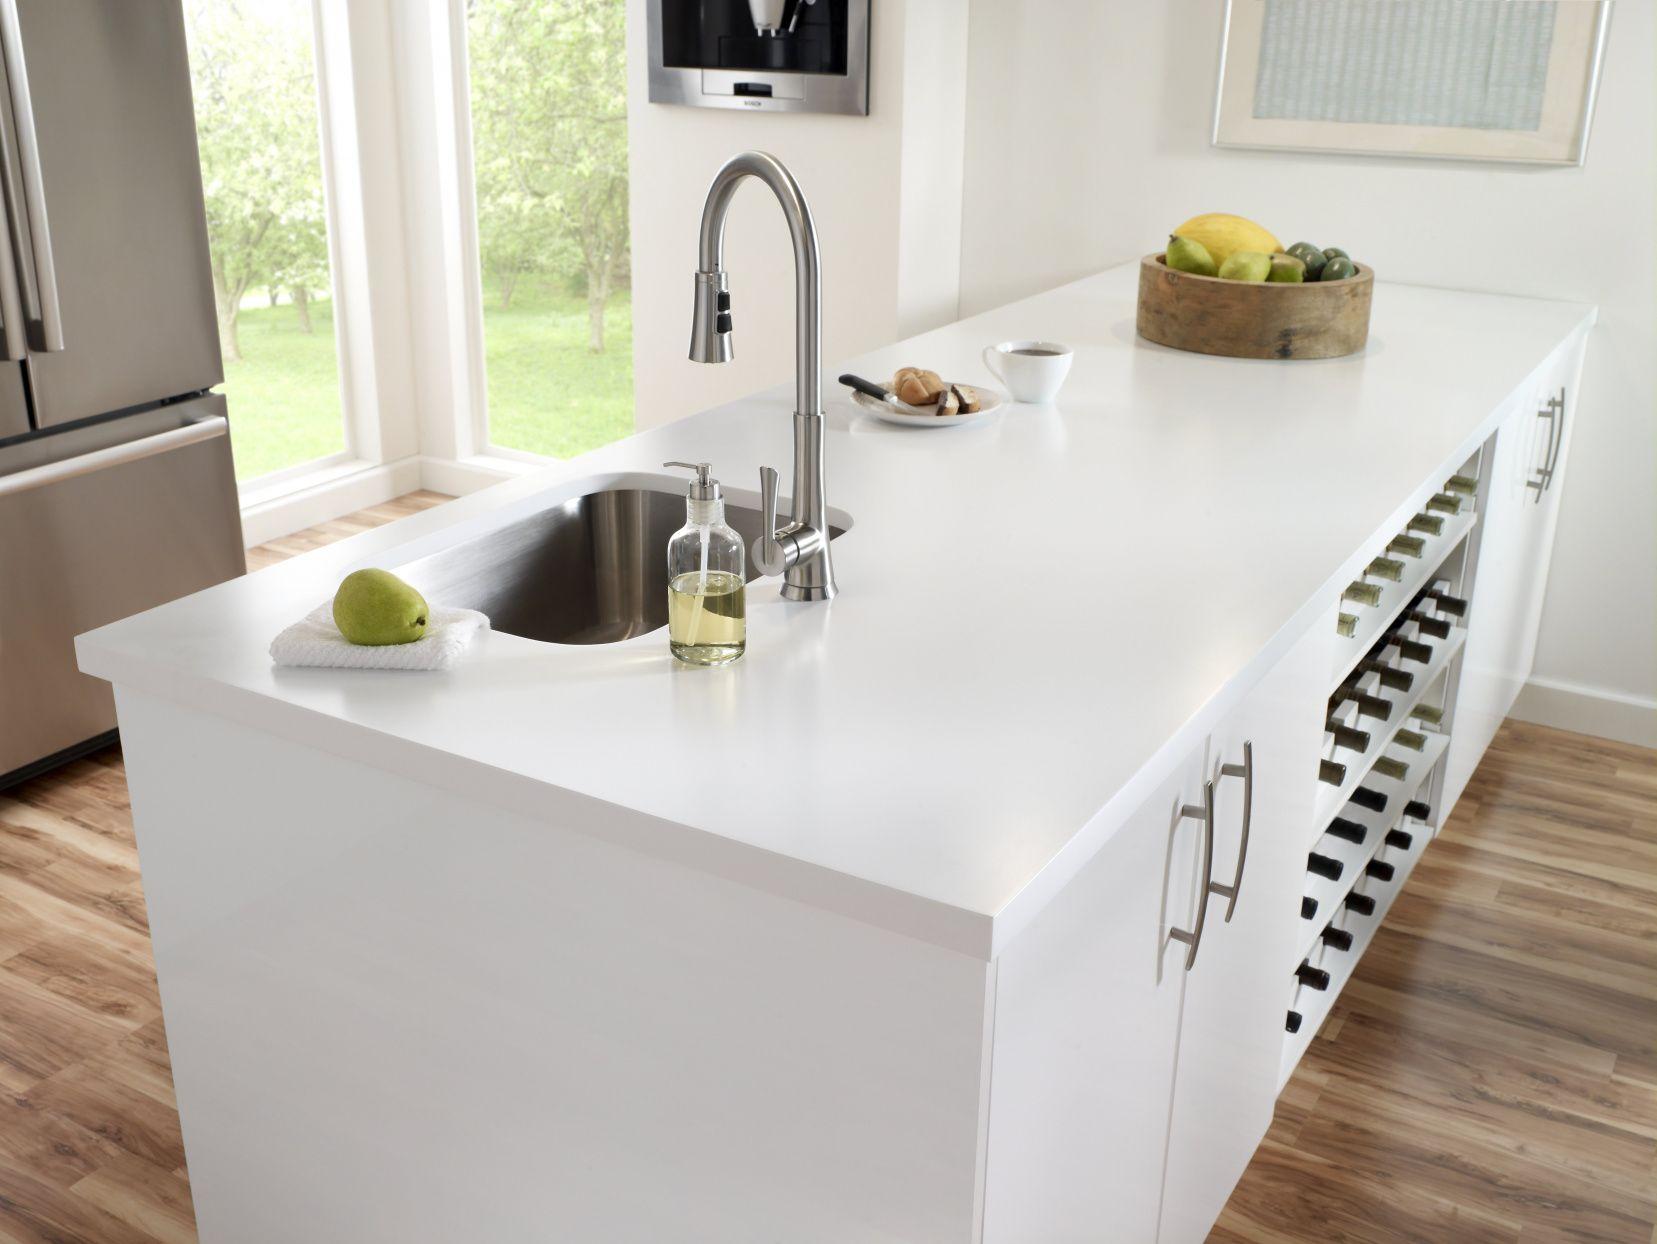 20+ Pros and Cons Of White Quartz Countertops - Small Kitchen island ...